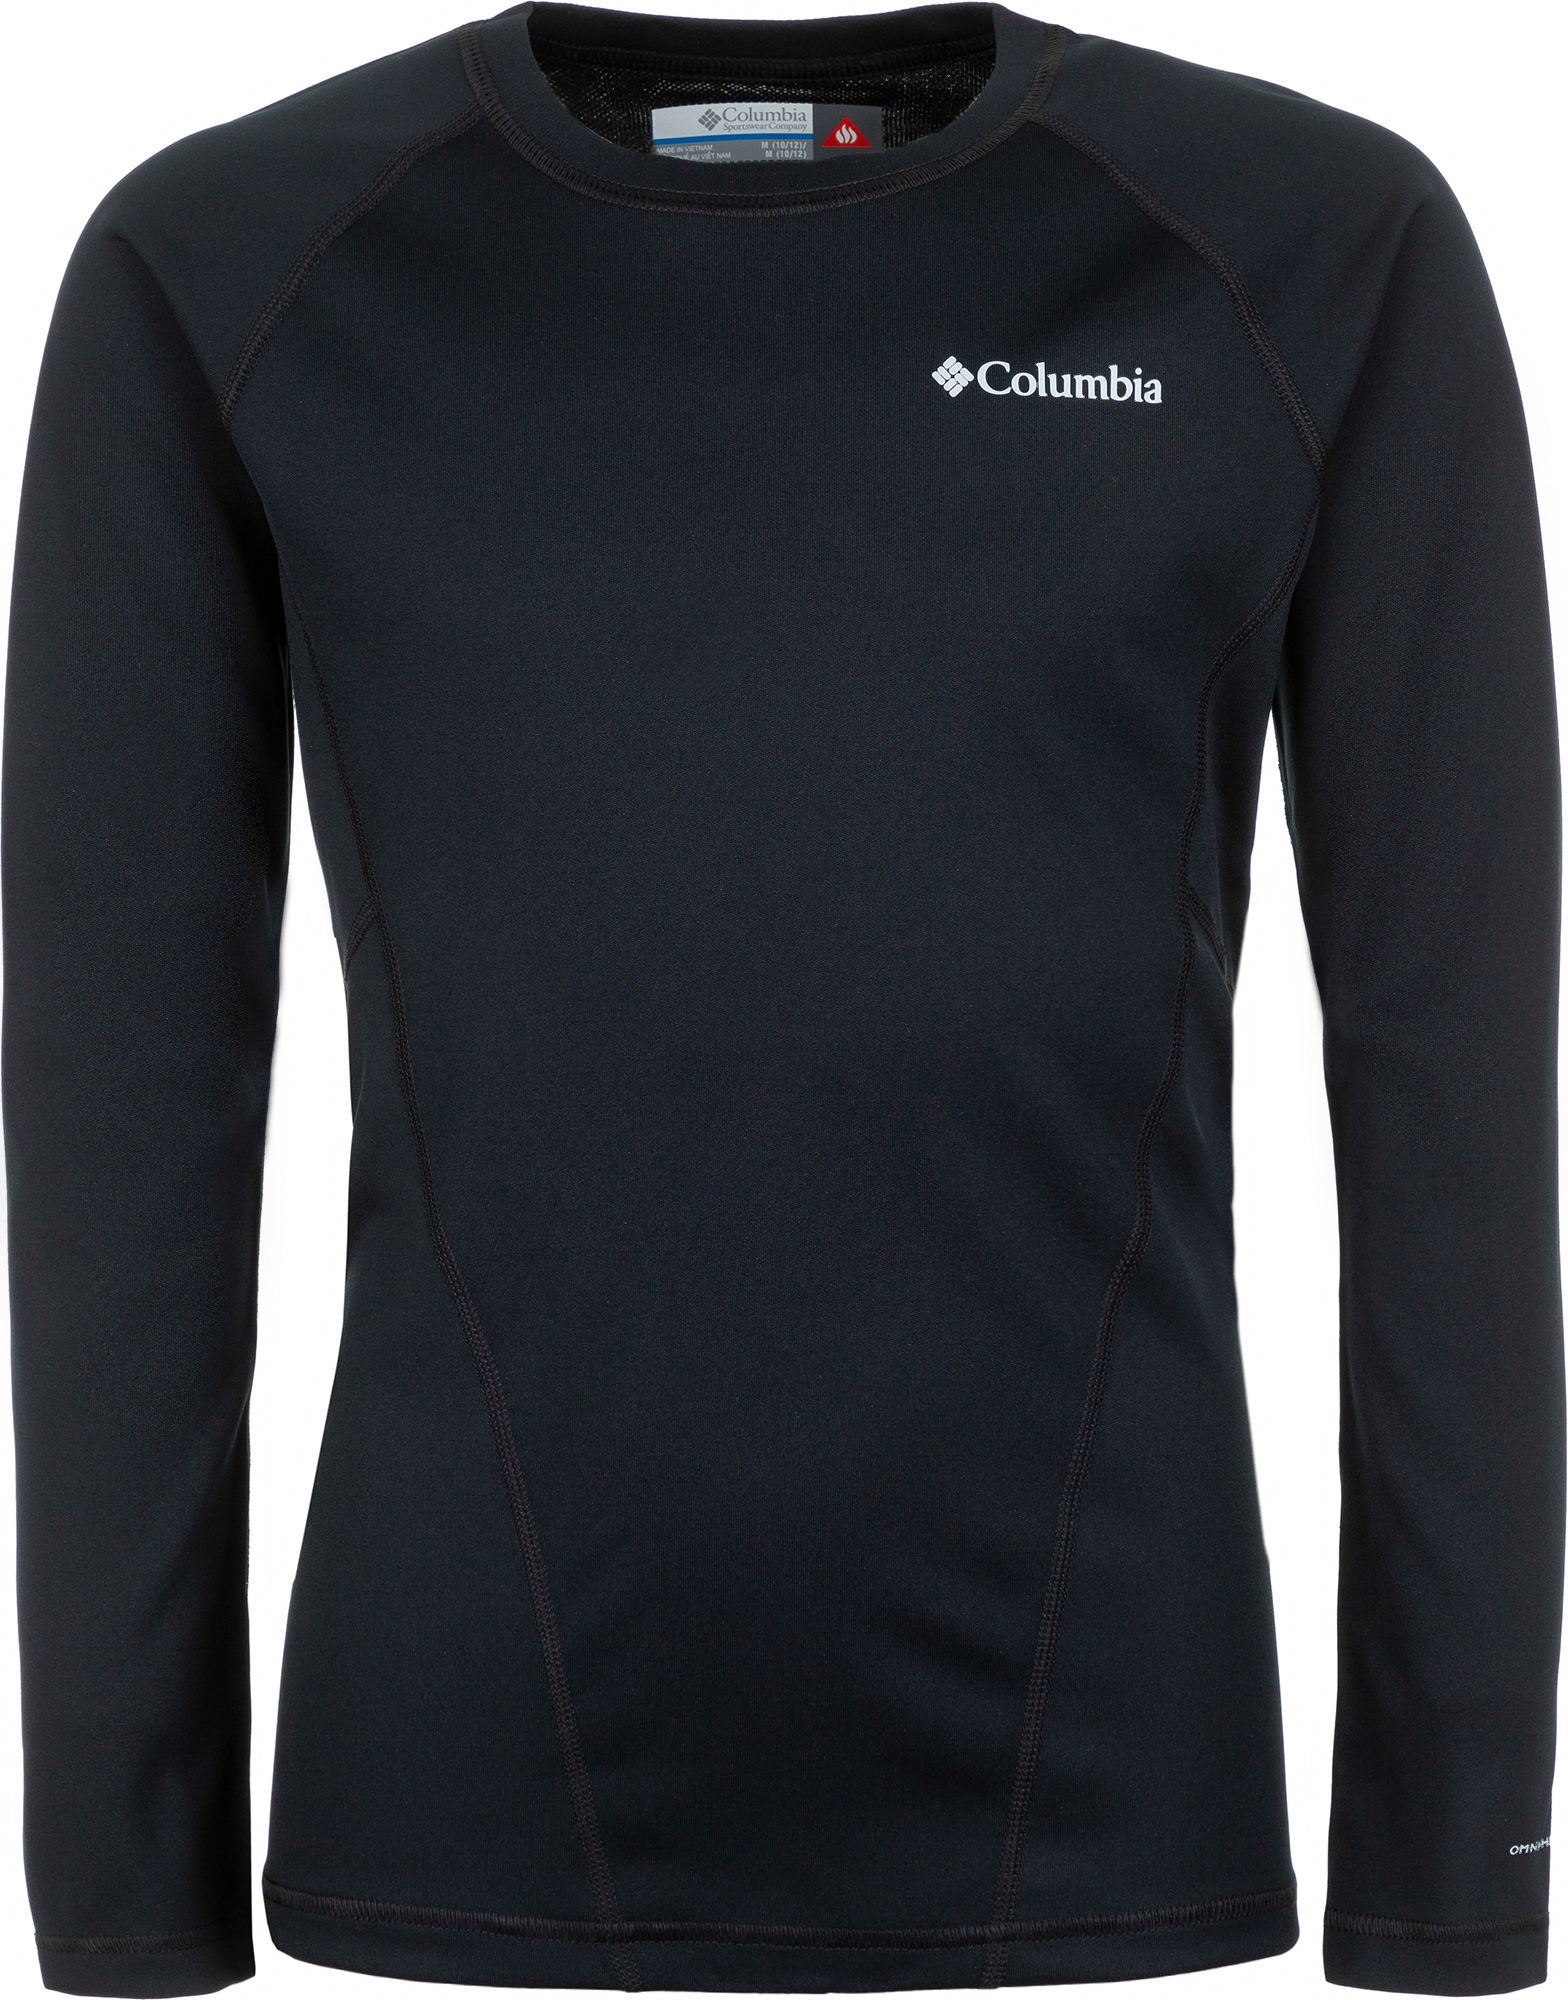 купить Columbia Свитшот для мальчиков Columbia Midweight Crew 2, размер 160-170 онлайн